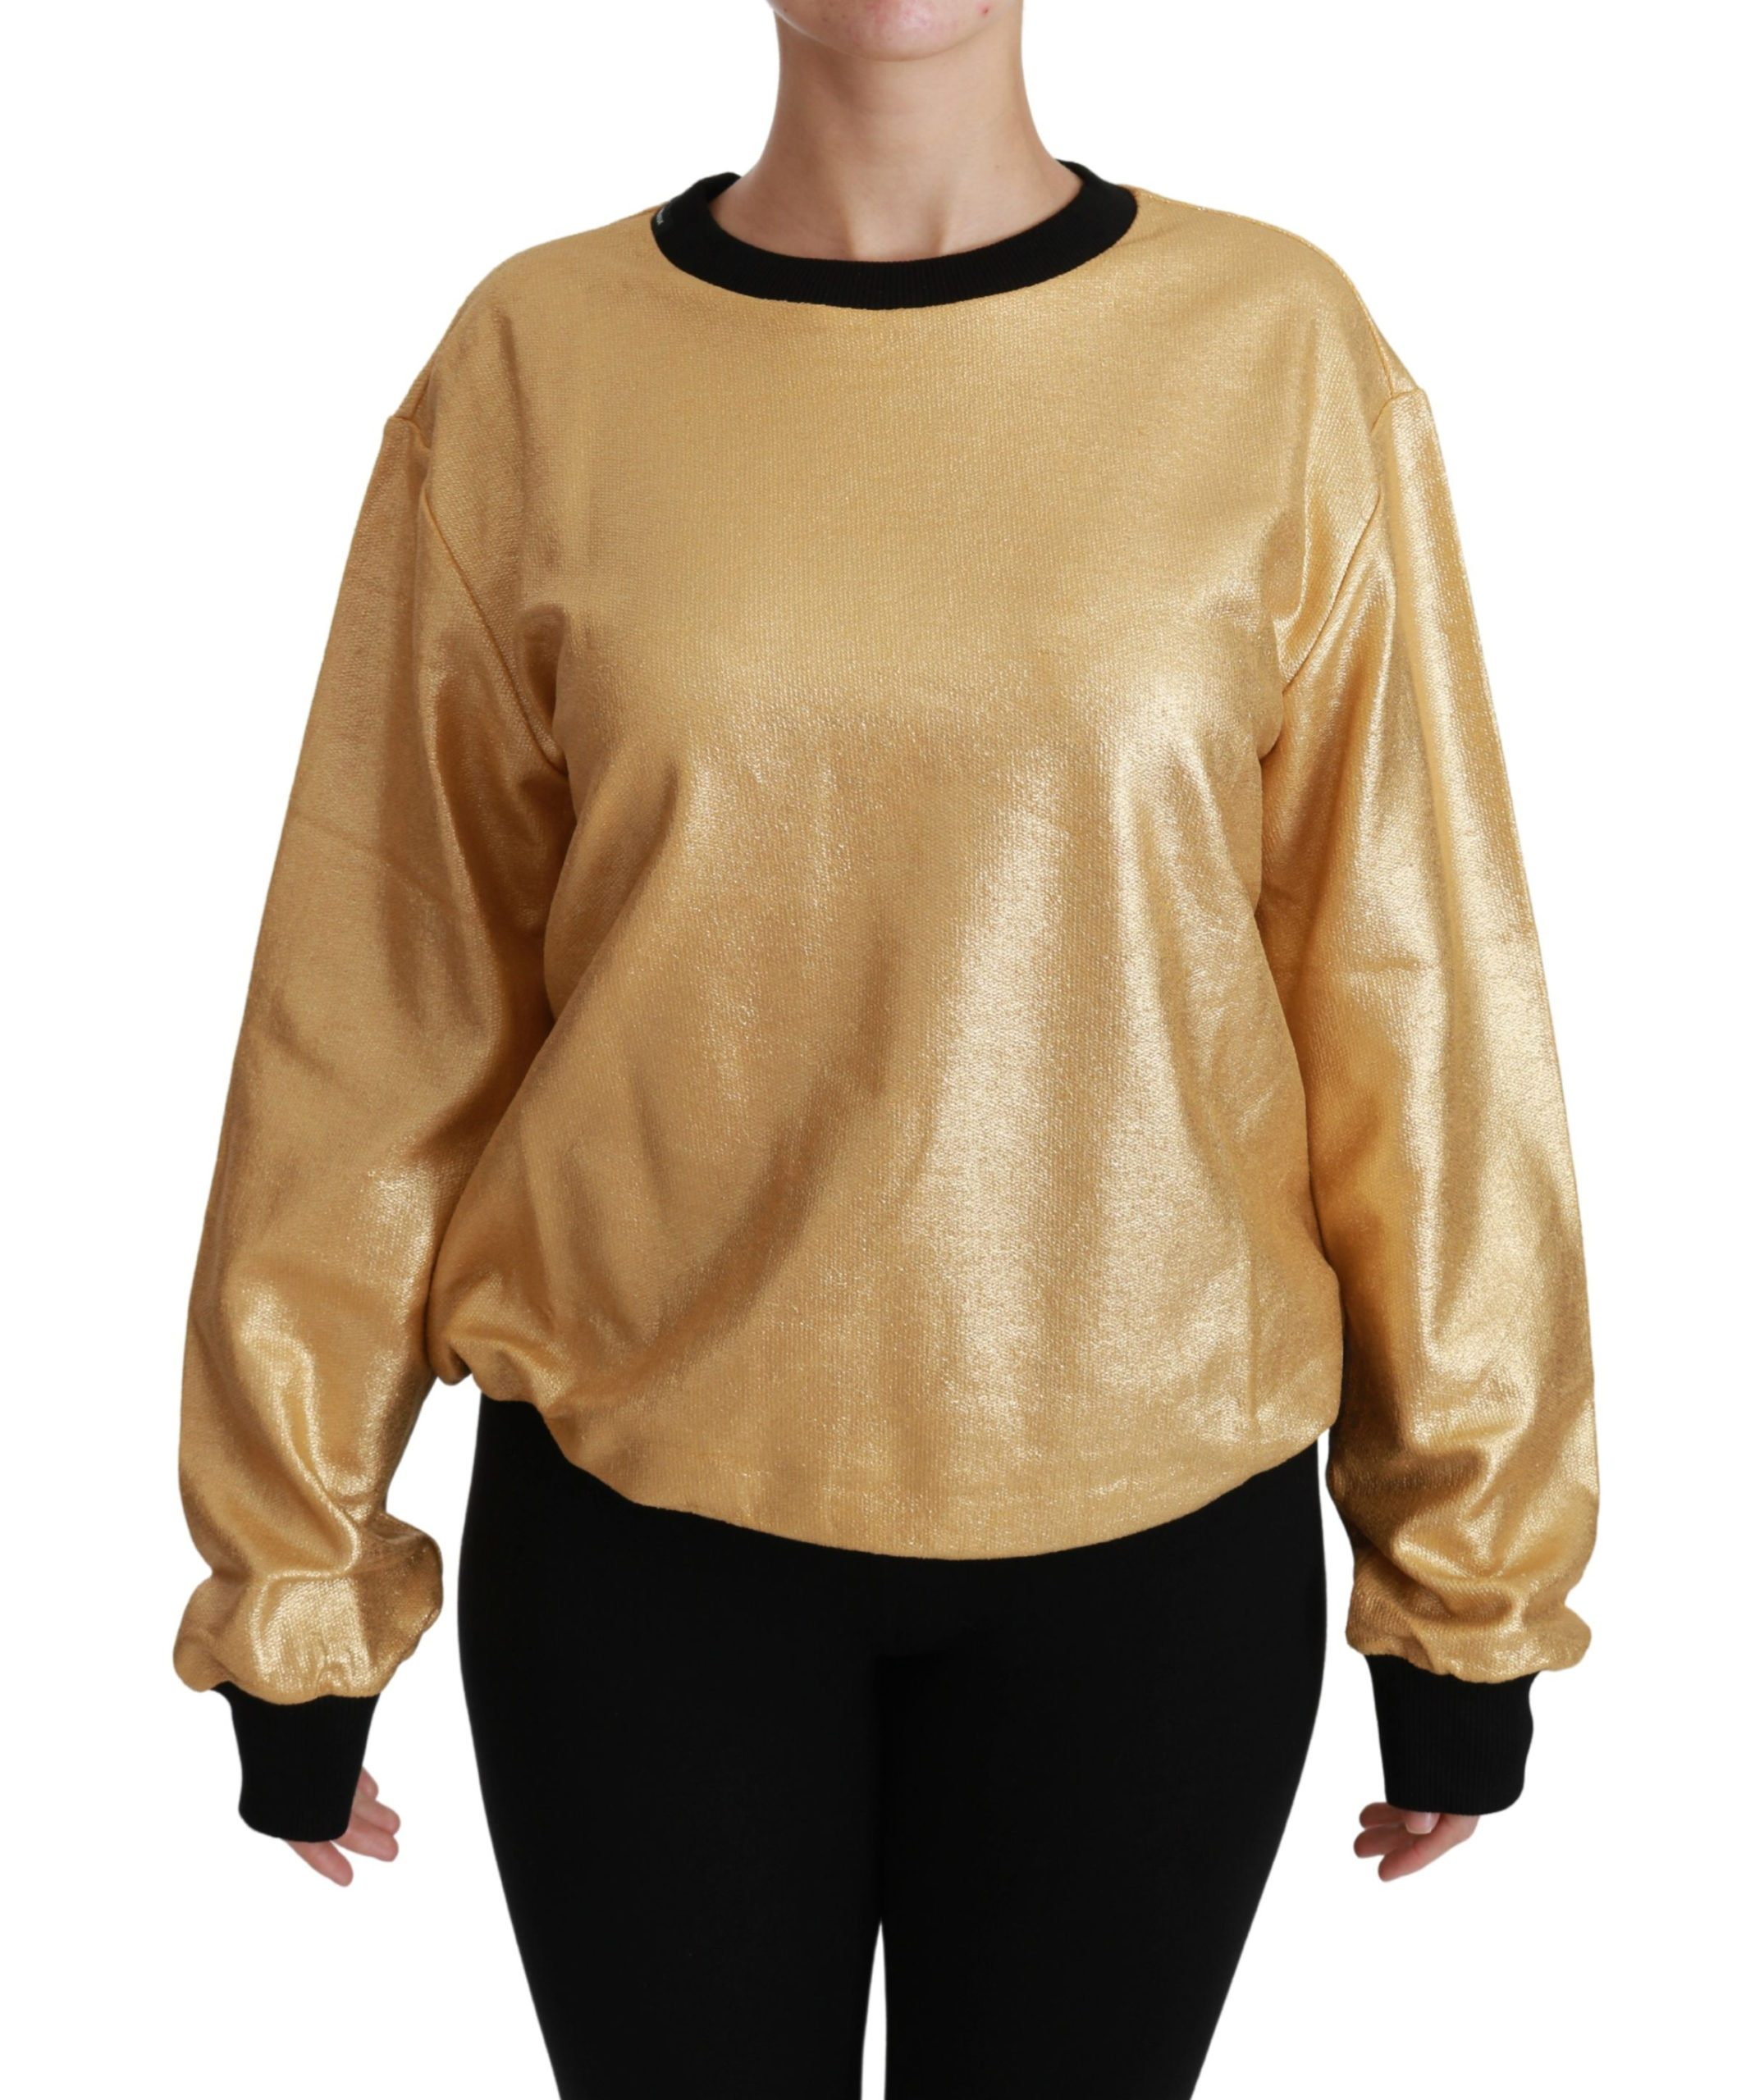 Dolce & Gabbana Women's Cotton Crewneck Pullover Sweater Gold TSH4417 - IT36 | XS